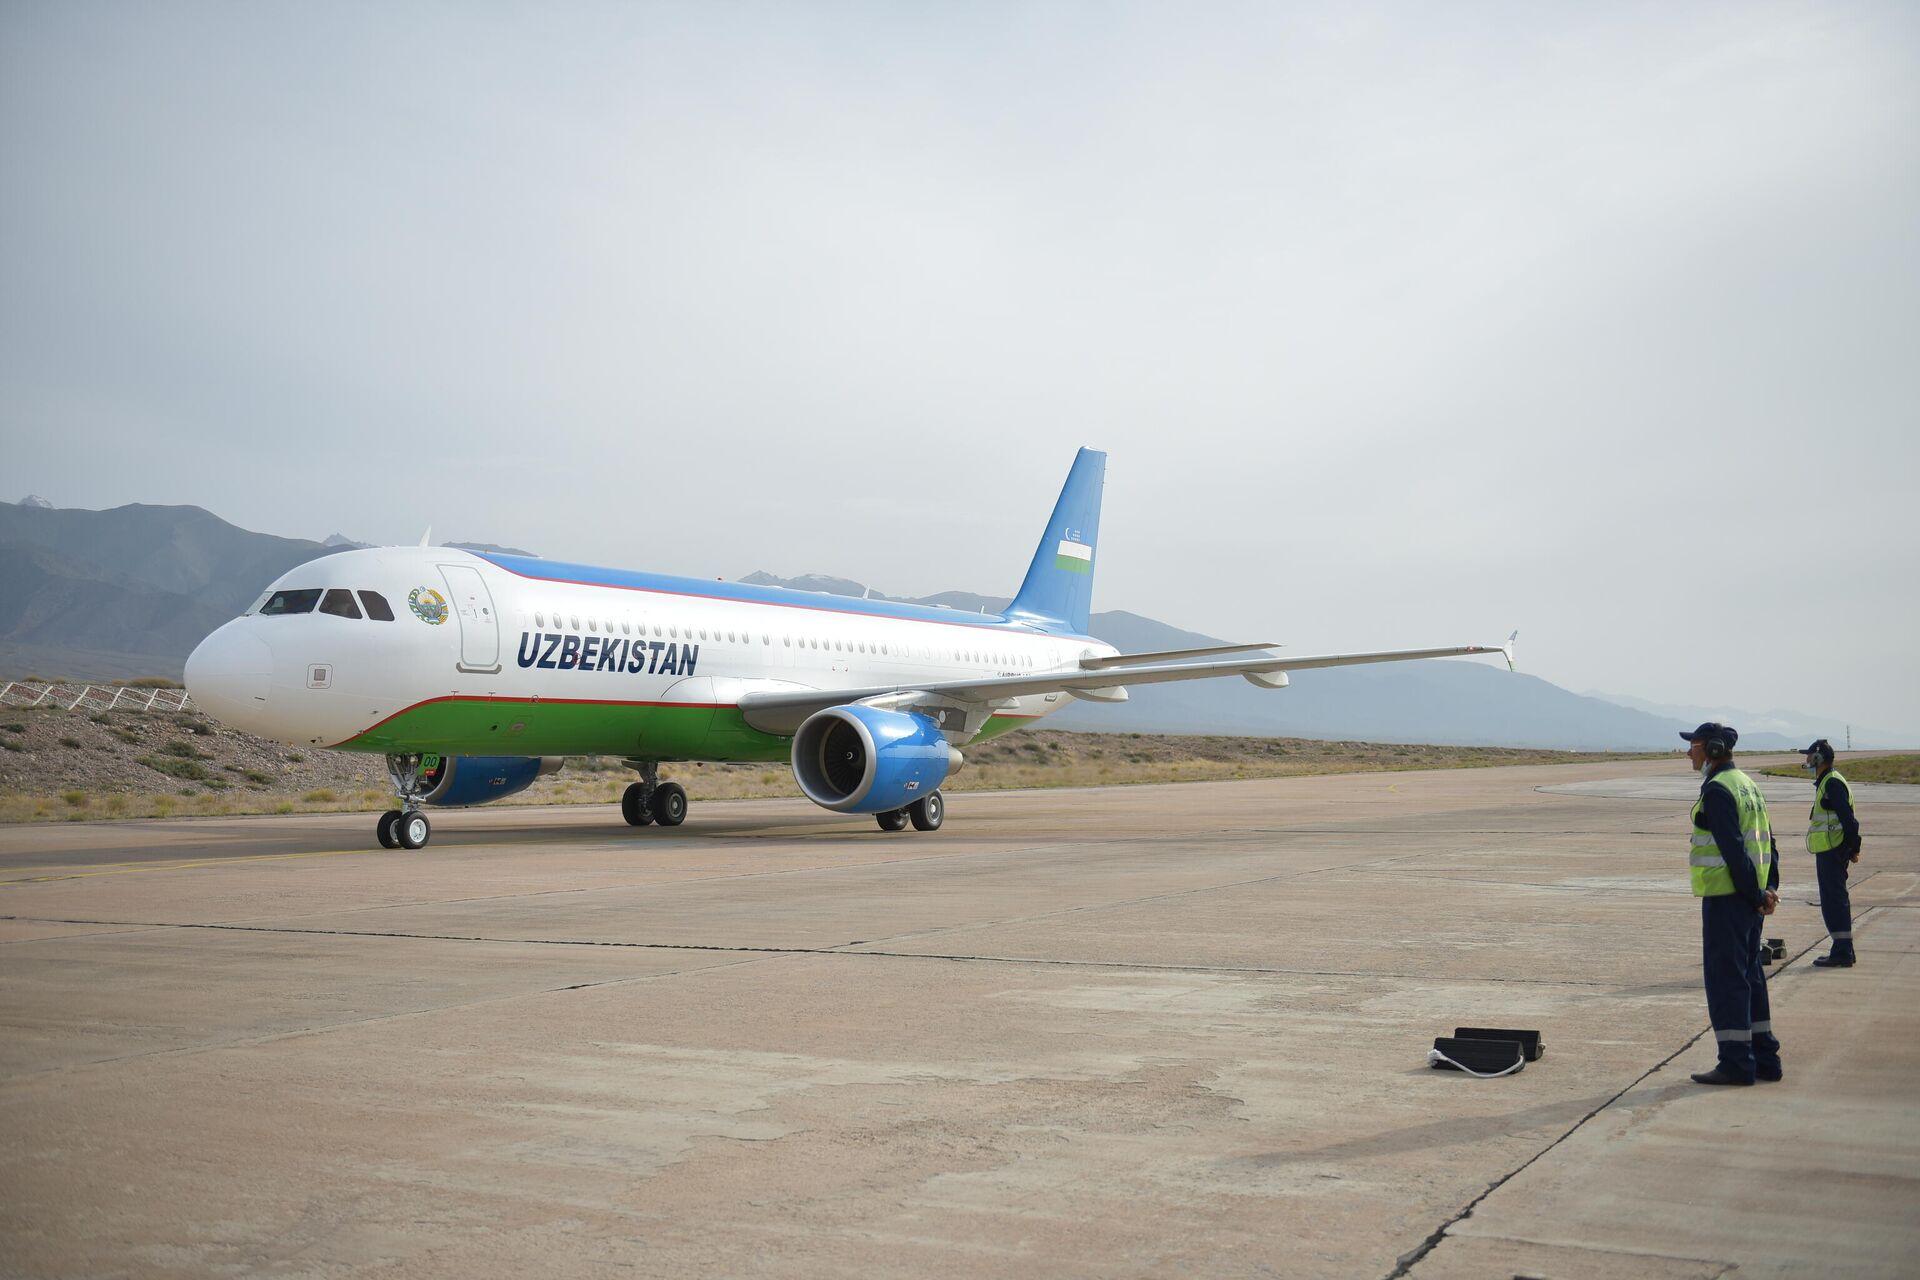 Премьер-министр Узбекистана Абдулла Арипов прибыл в Кыргызстан - Sputnik Ўзбекистон, 1920, 20.08.2021